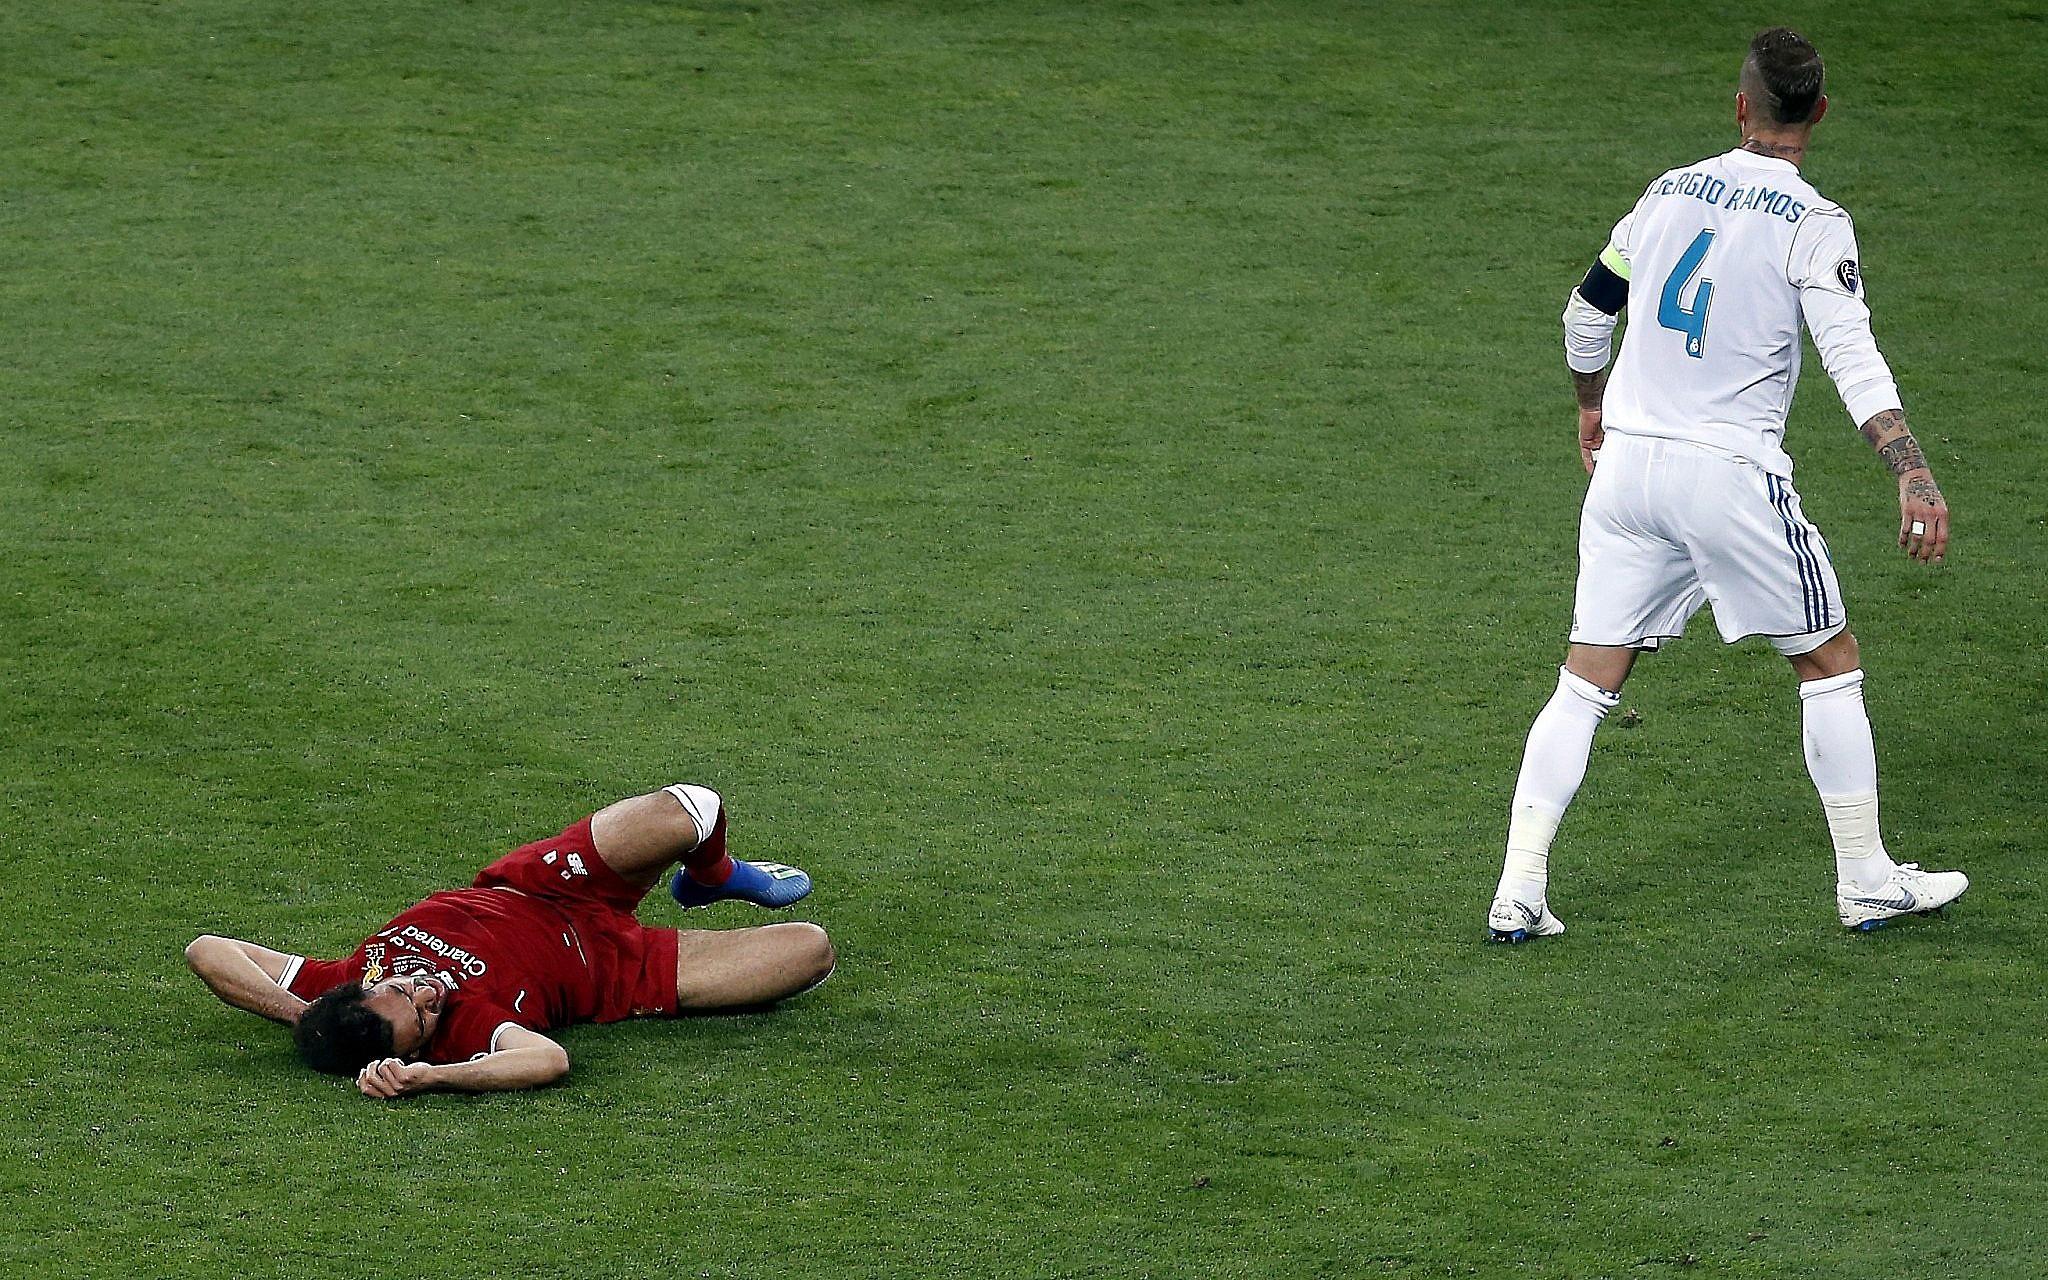 ae7647adb3b Soccer hero s World Cup in doubt